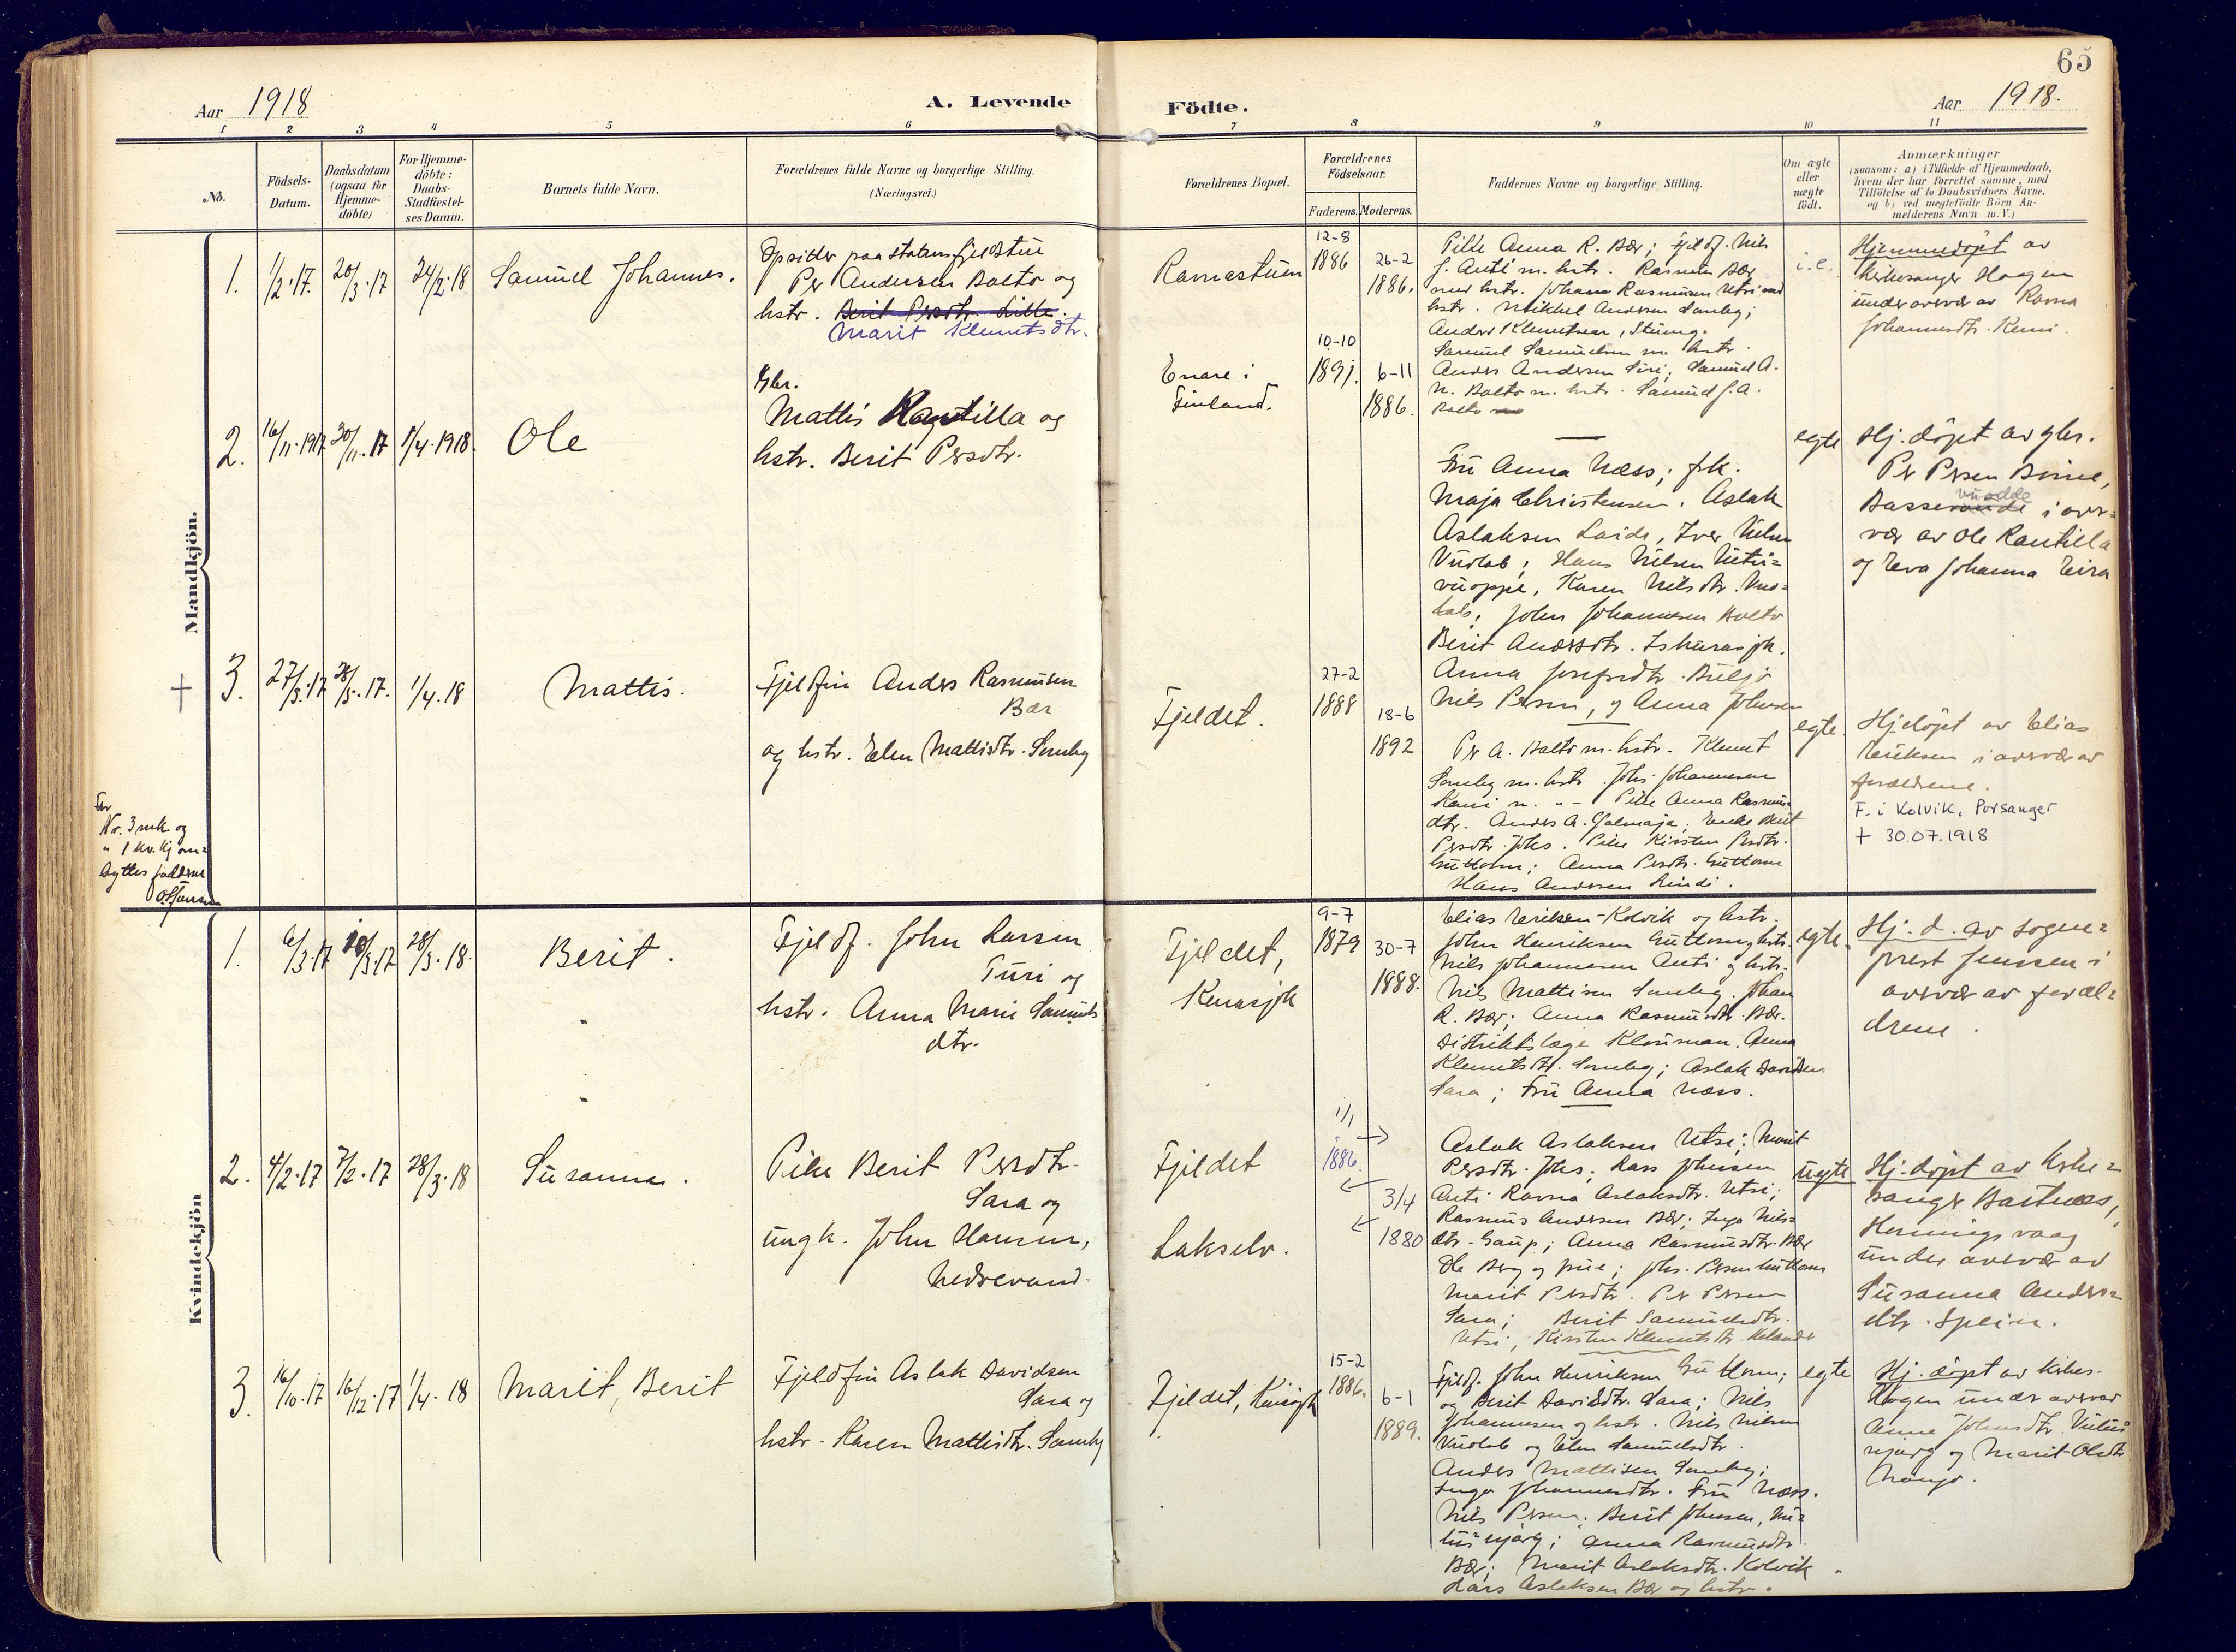 SATØ, Karasjok sokneprestkontor, H/Ha: Ministerialbok nr. 3, 1907-1926, s. 65